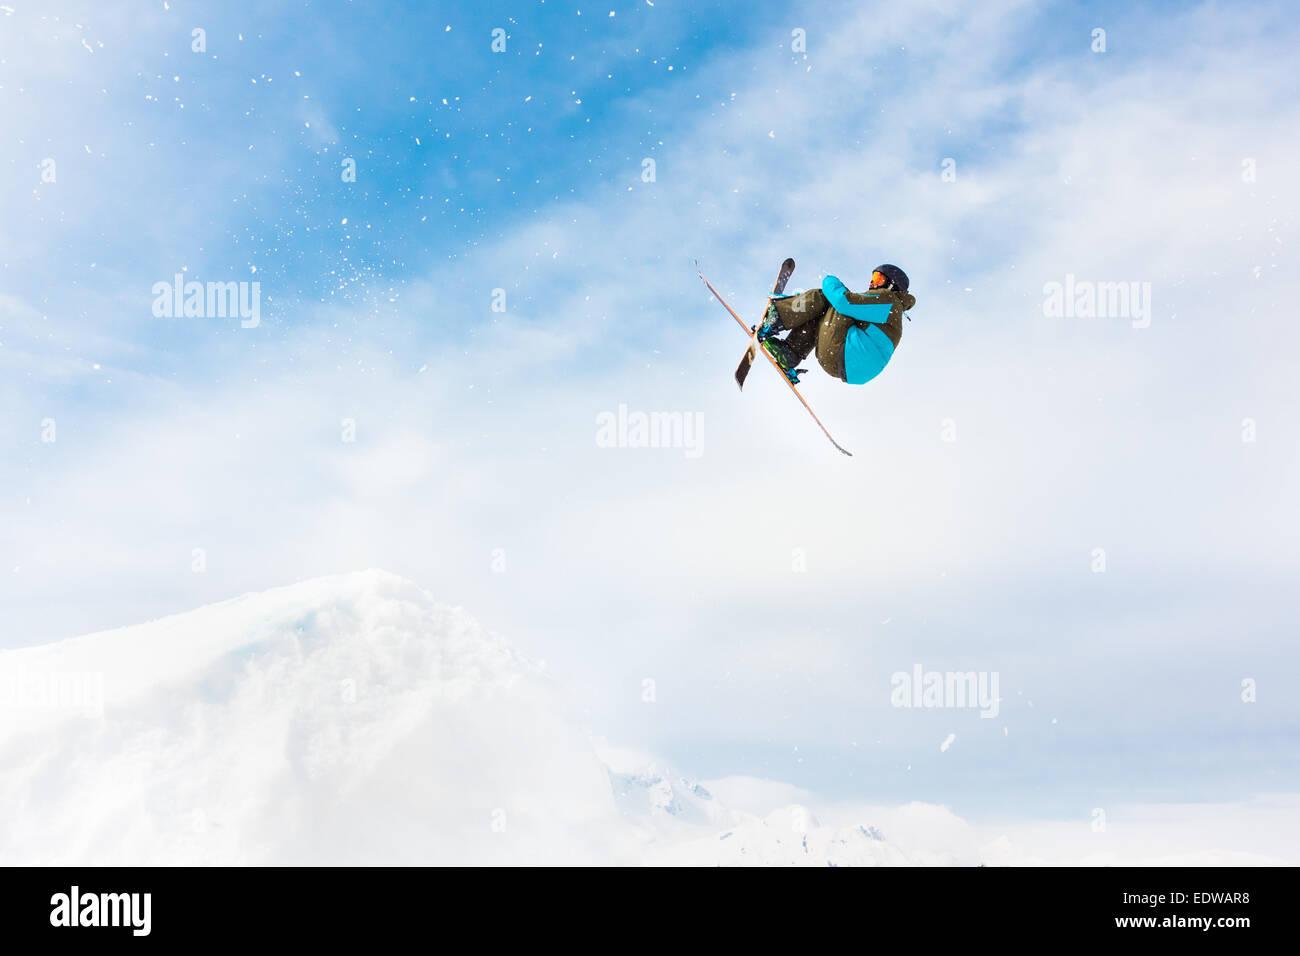 Free style skier. - Stock Image